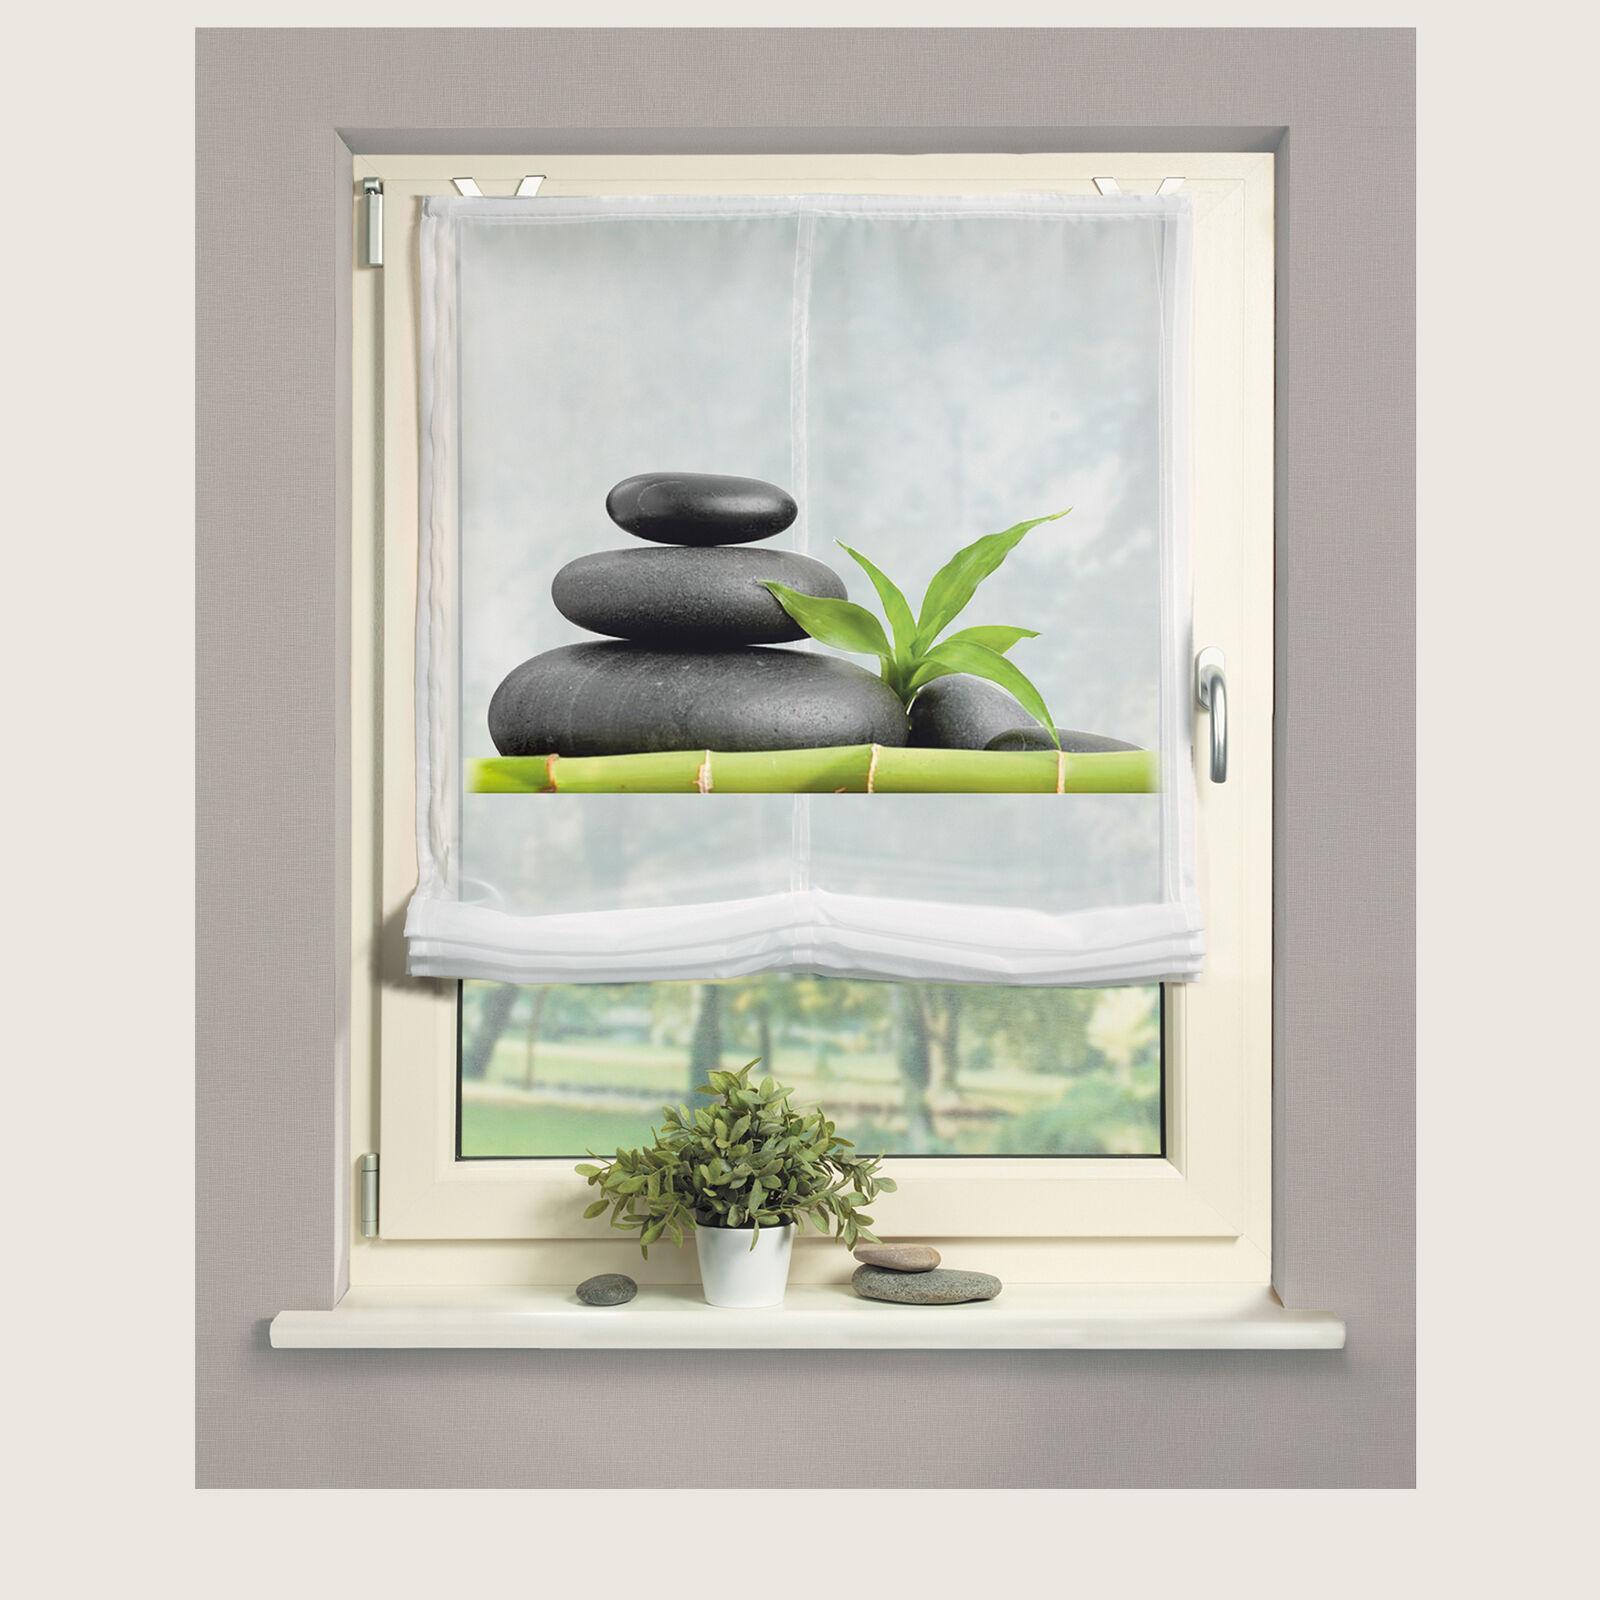 carozo raffrollo raffgardine raffstore rollo easyfix home wohnideen schmidtgard ebay. Black Bedroom Furniture Sets. Home Design Ideas